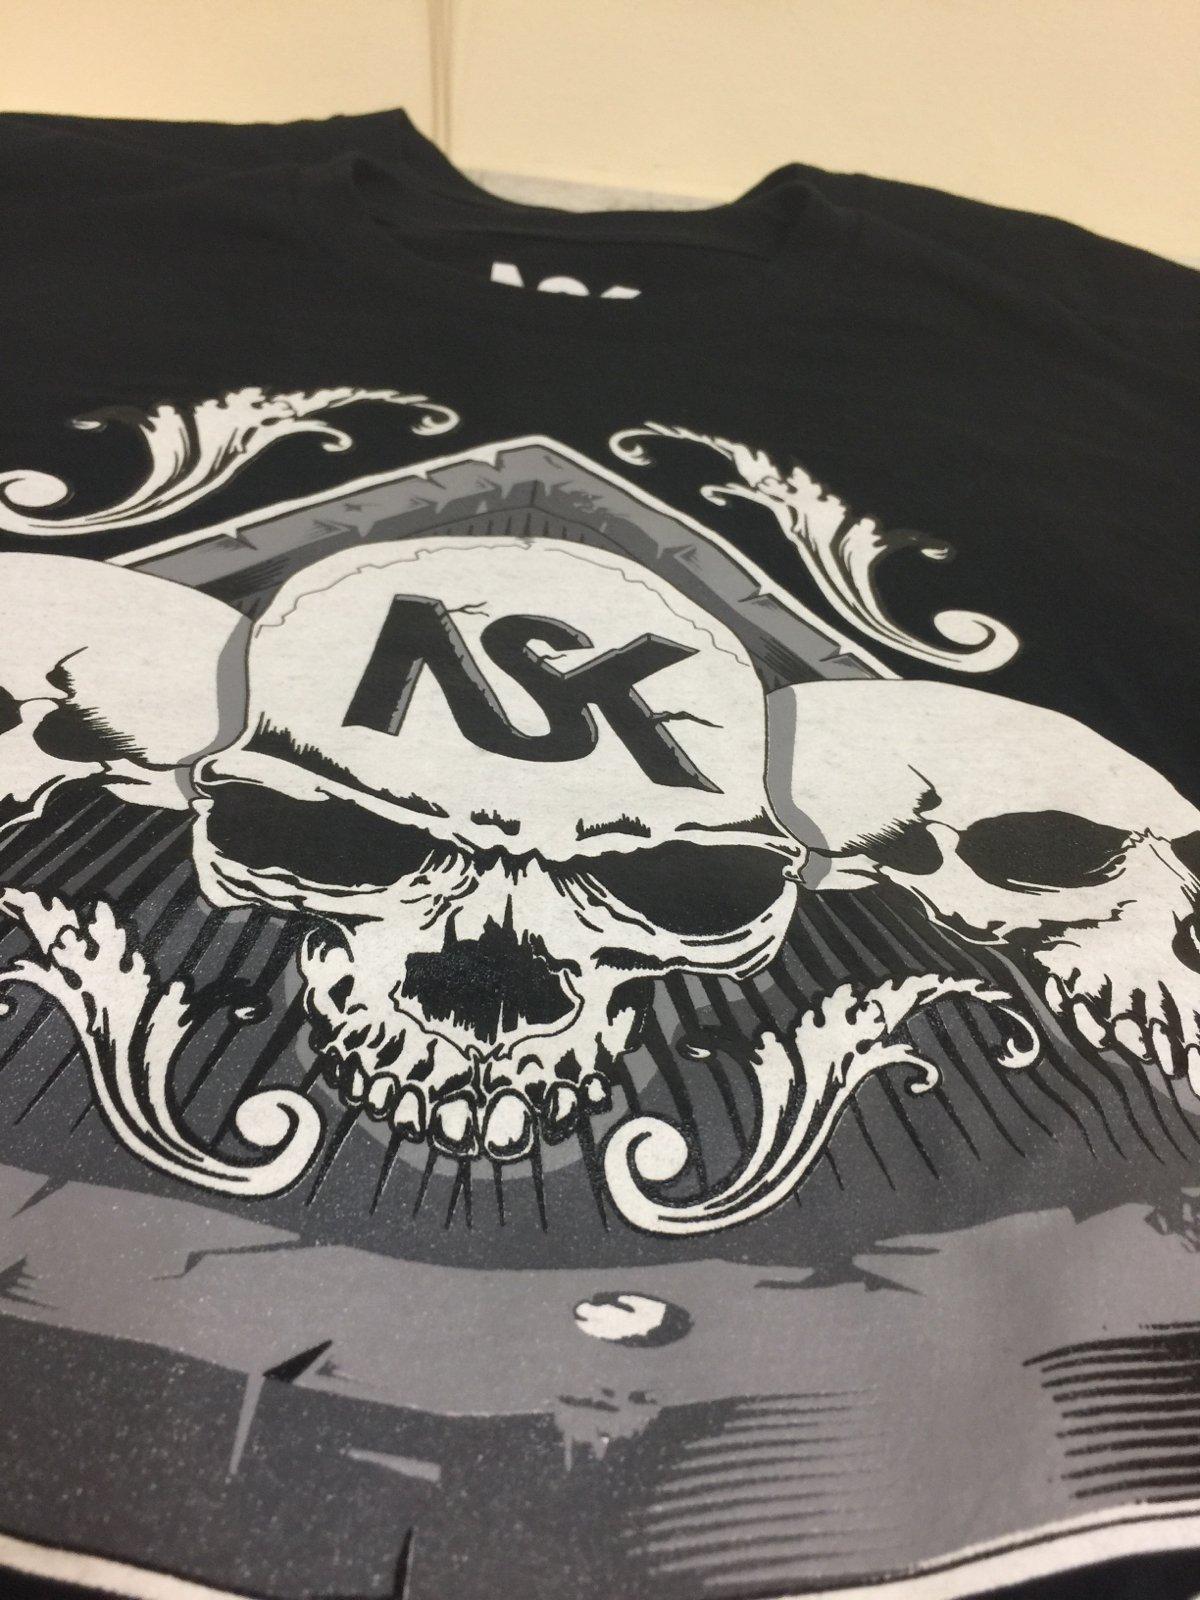 Image of NSK Tee